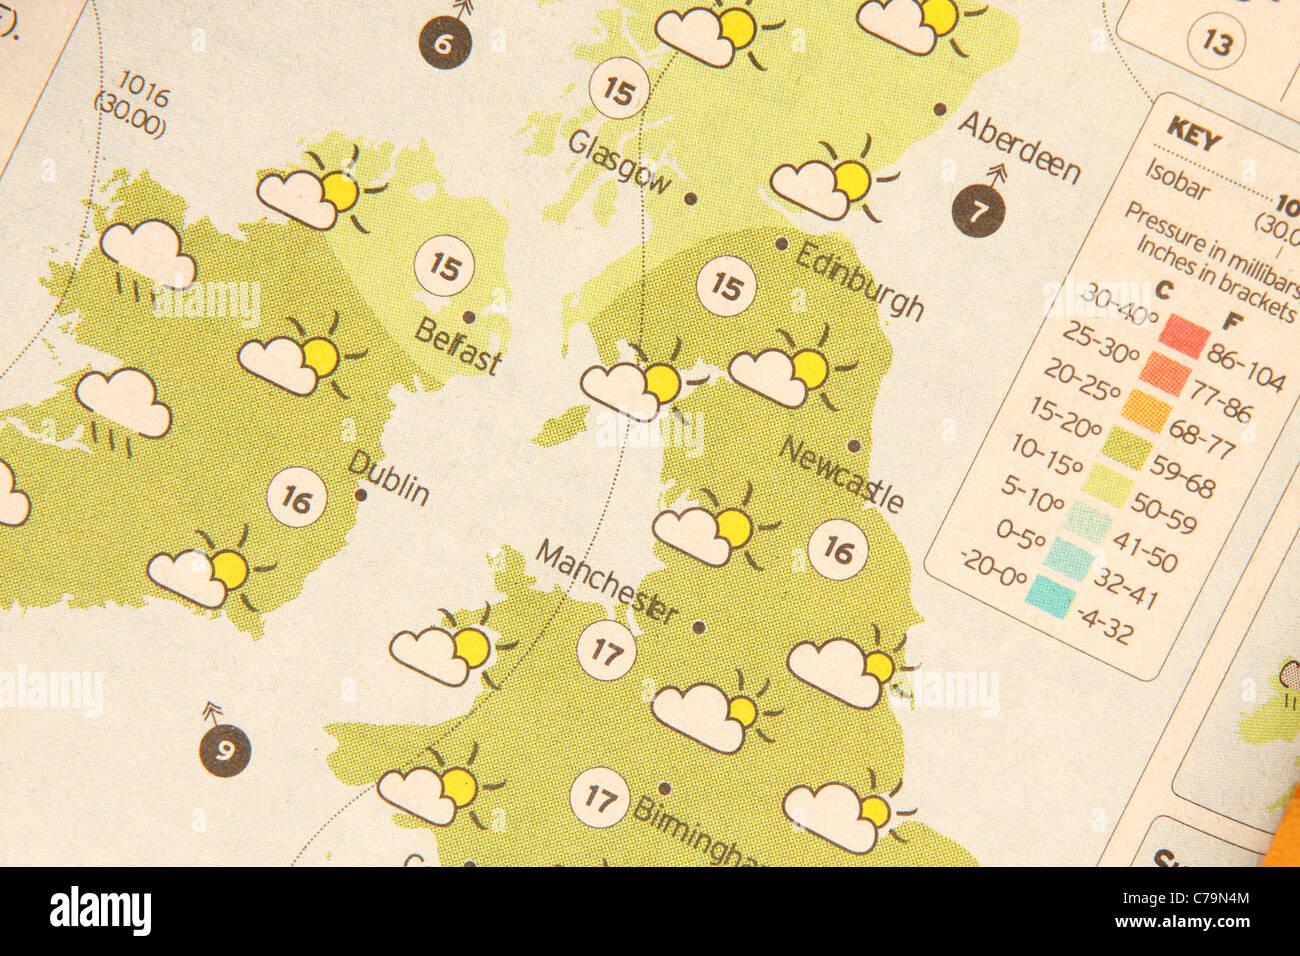 Previsión meteorológica mapa en un periódico Imagen De Stock